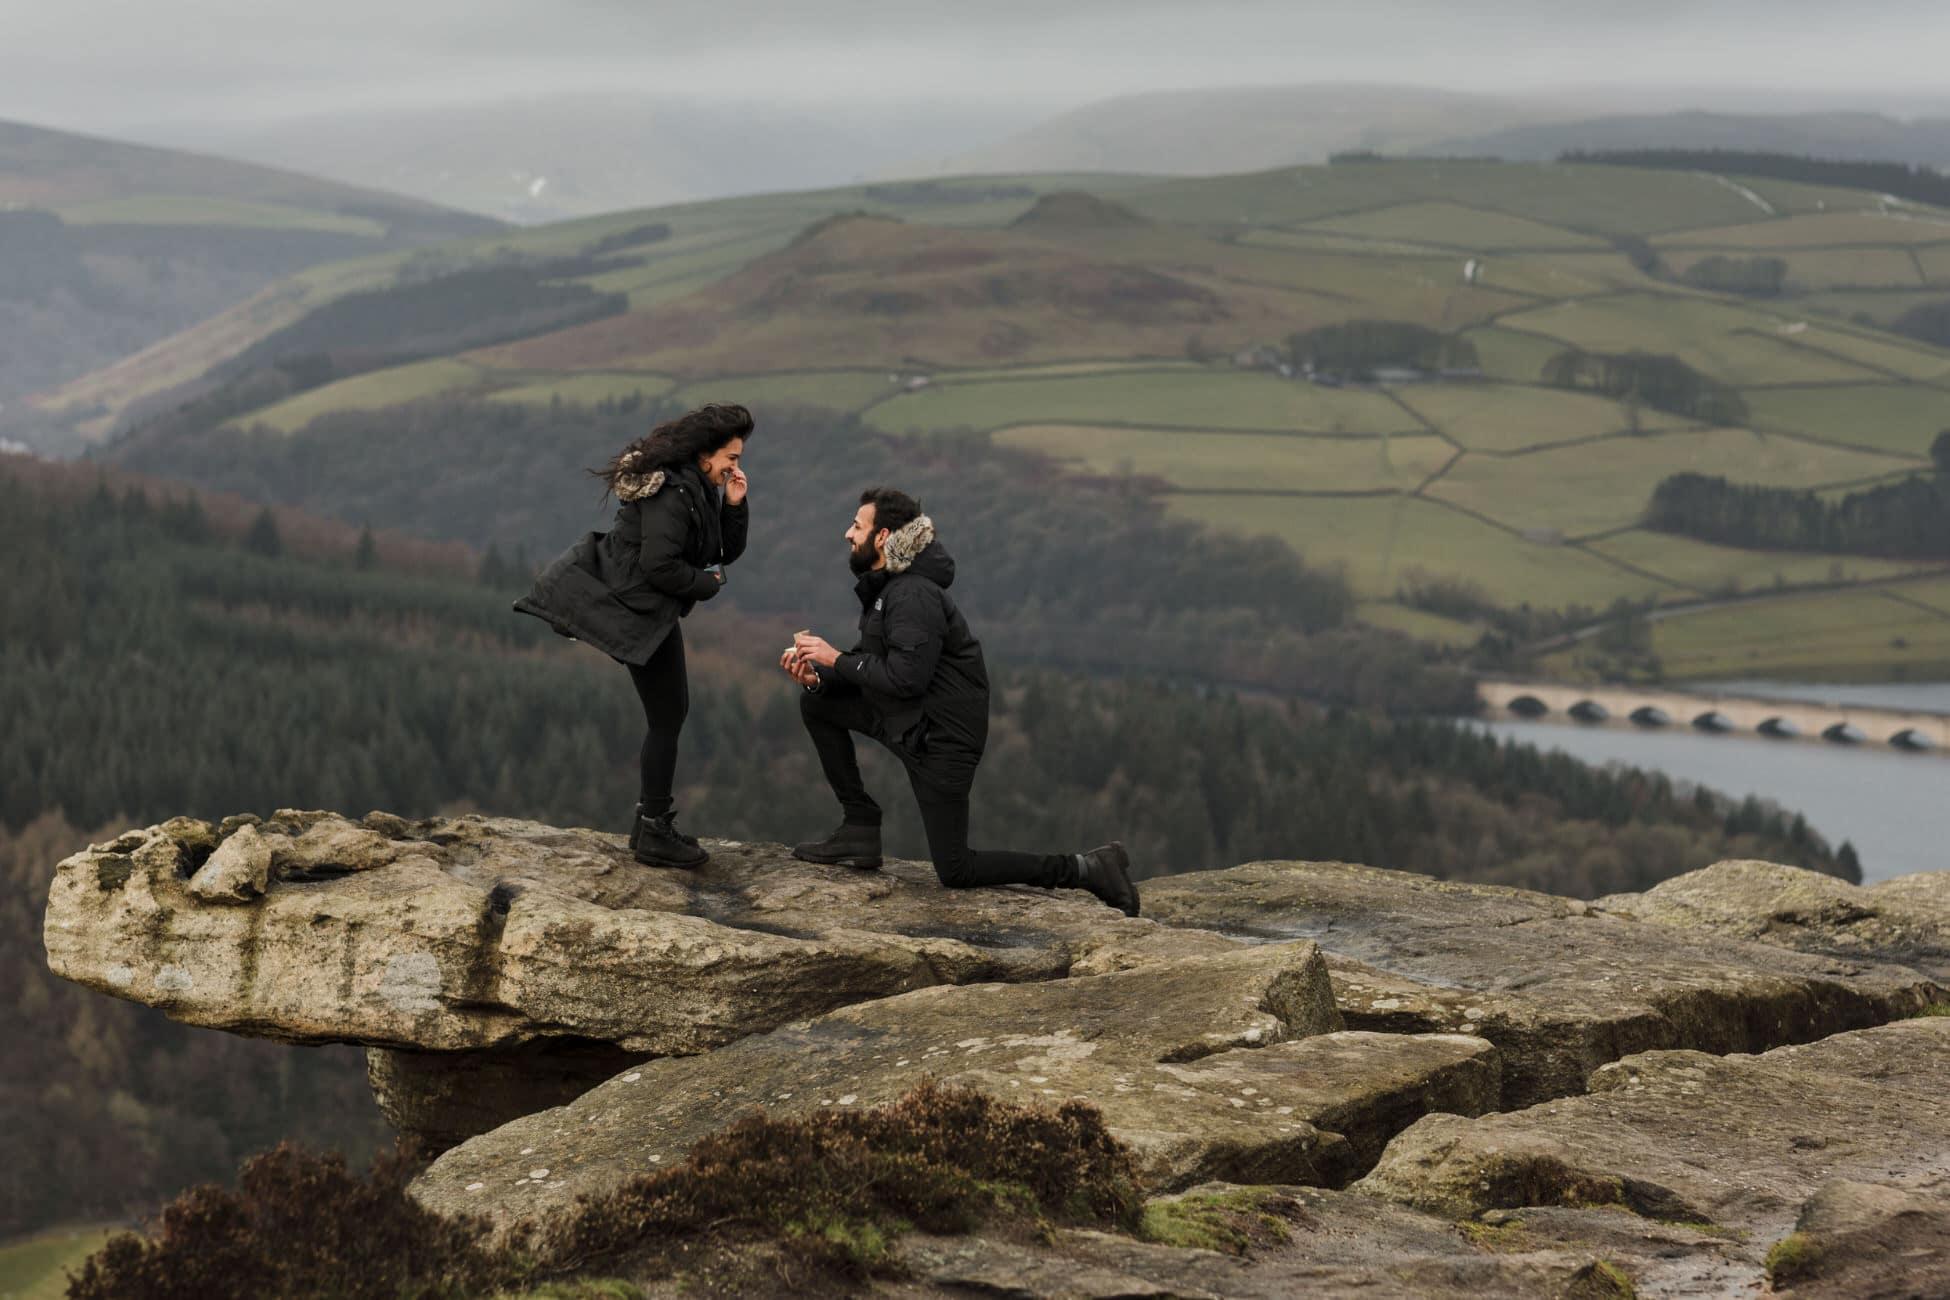 Surprise engagement proposal photo Bamford Edge in the Peak District